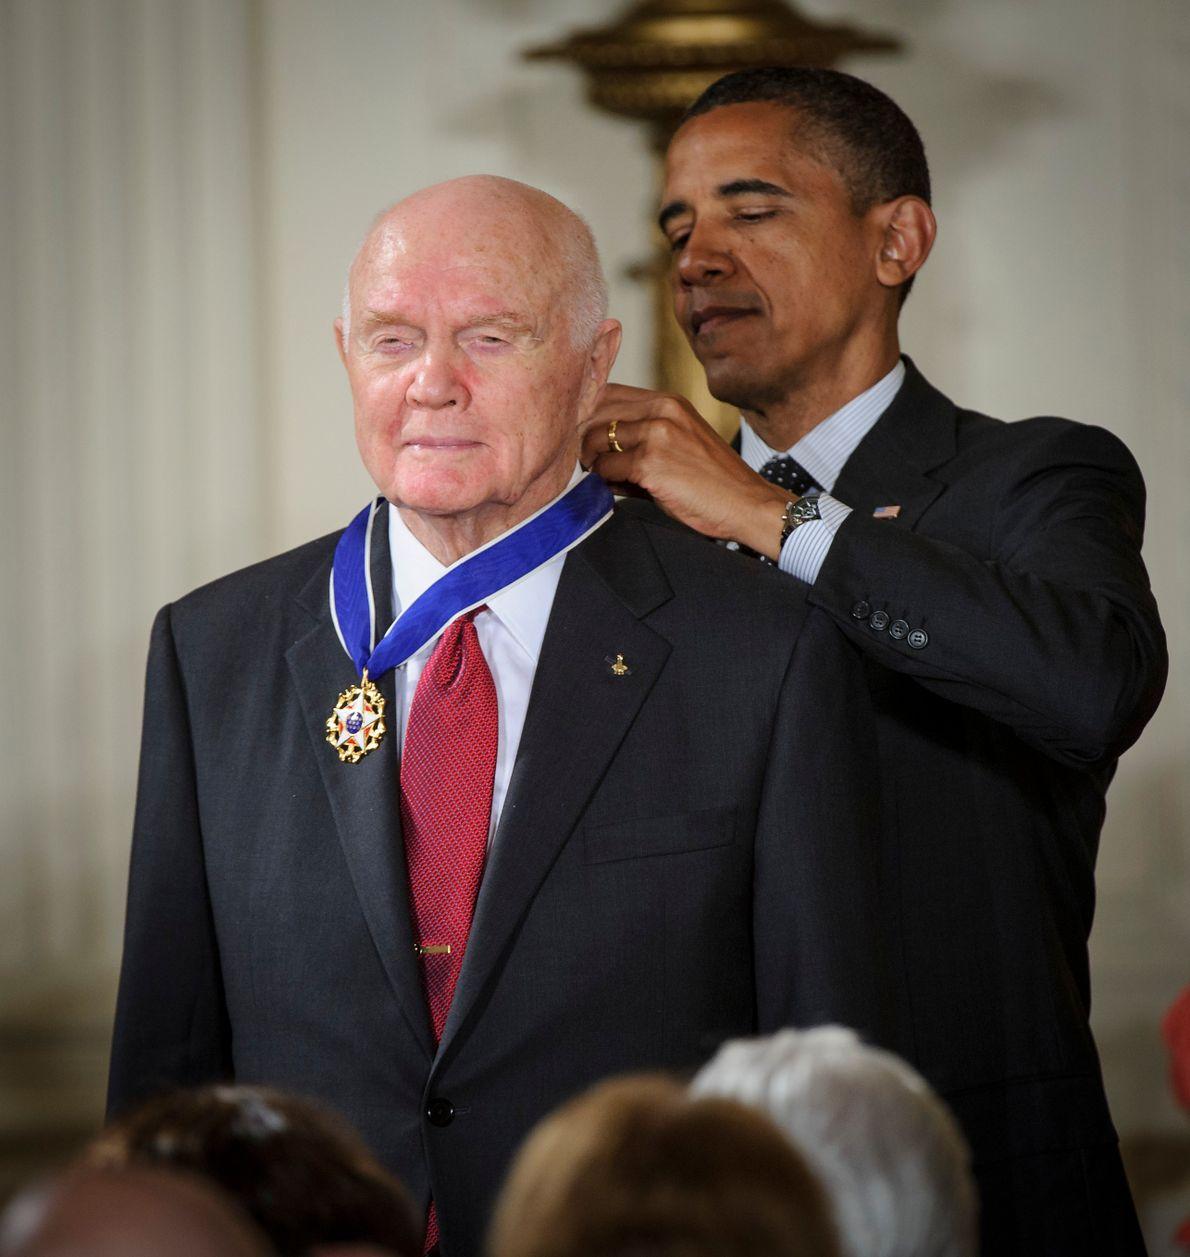 Barack Obama otorga a John Glenn la Medalla Presidencial de la Libertad